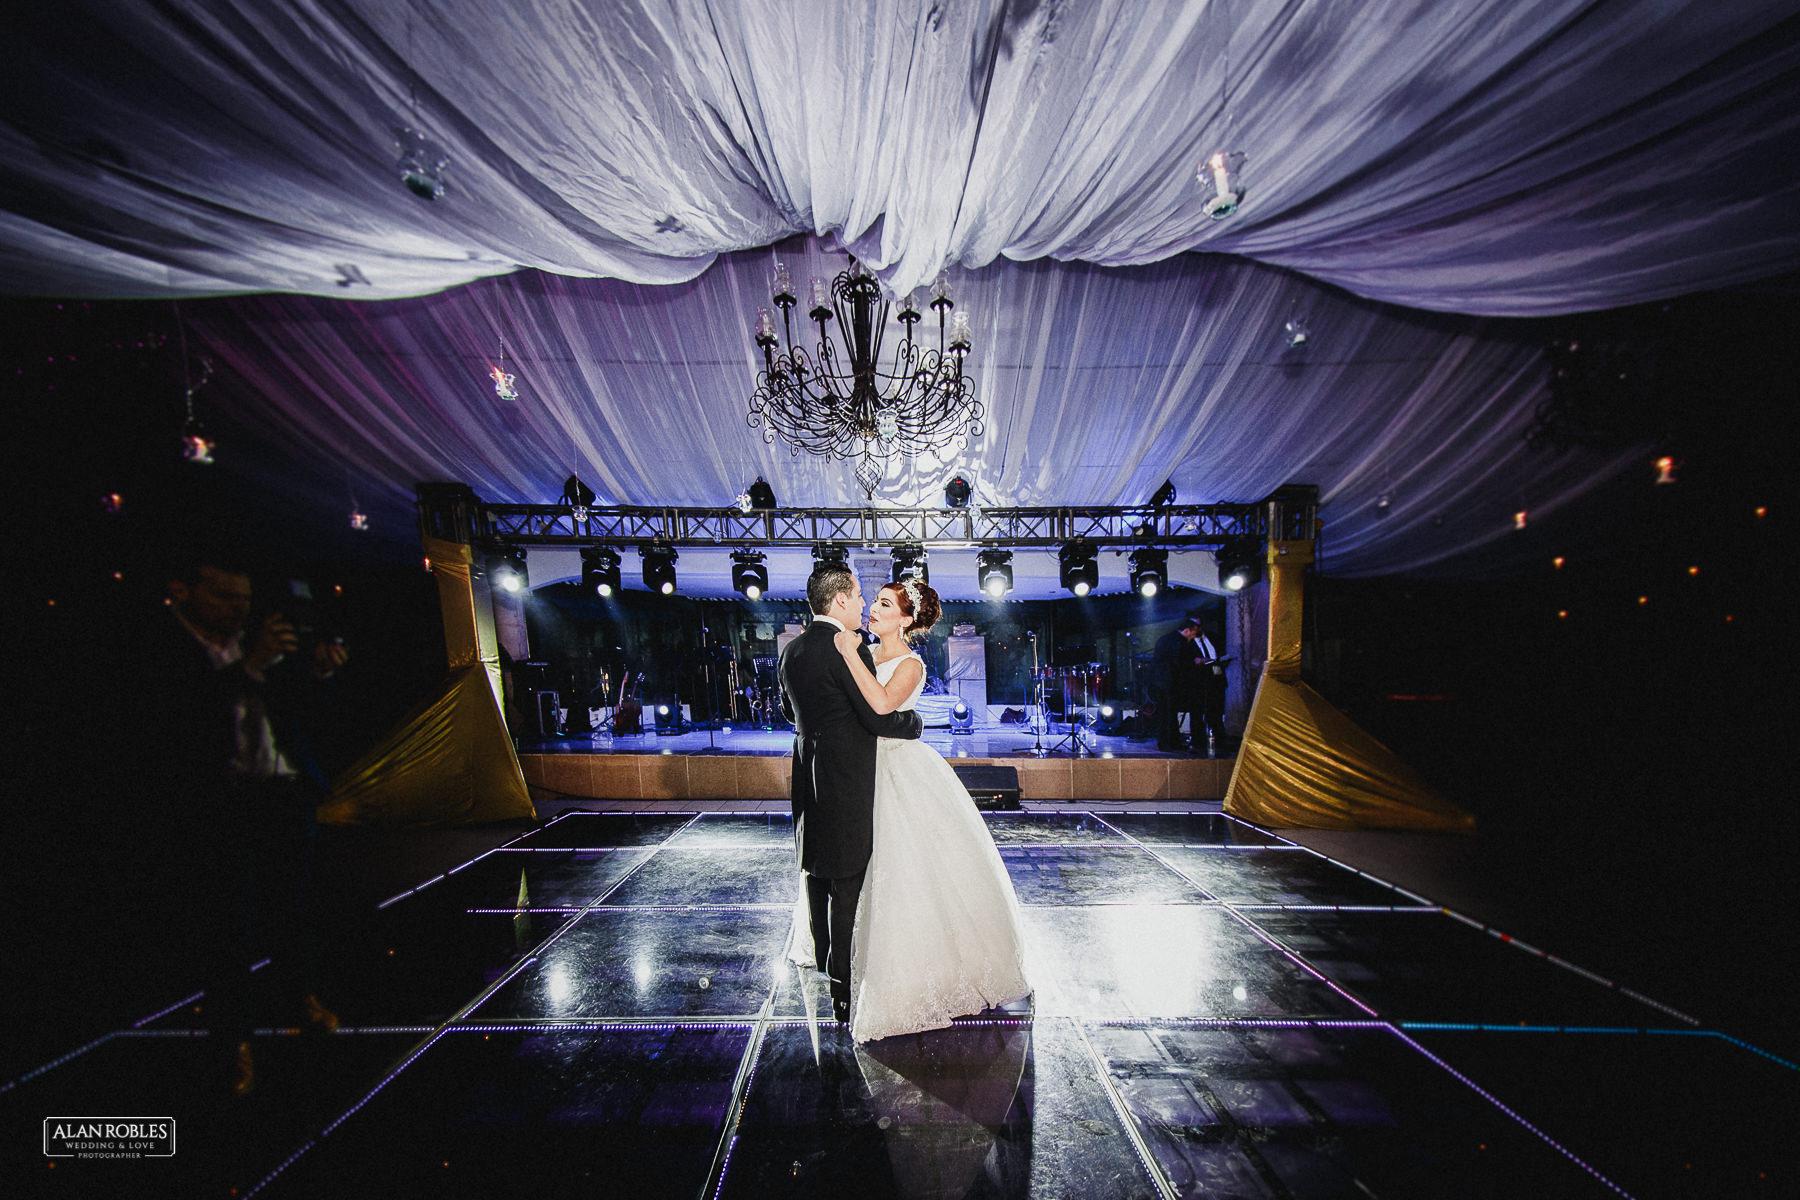 Alan Robles fotografo de bodas guadalajara - LyP Hotel Demetria-64